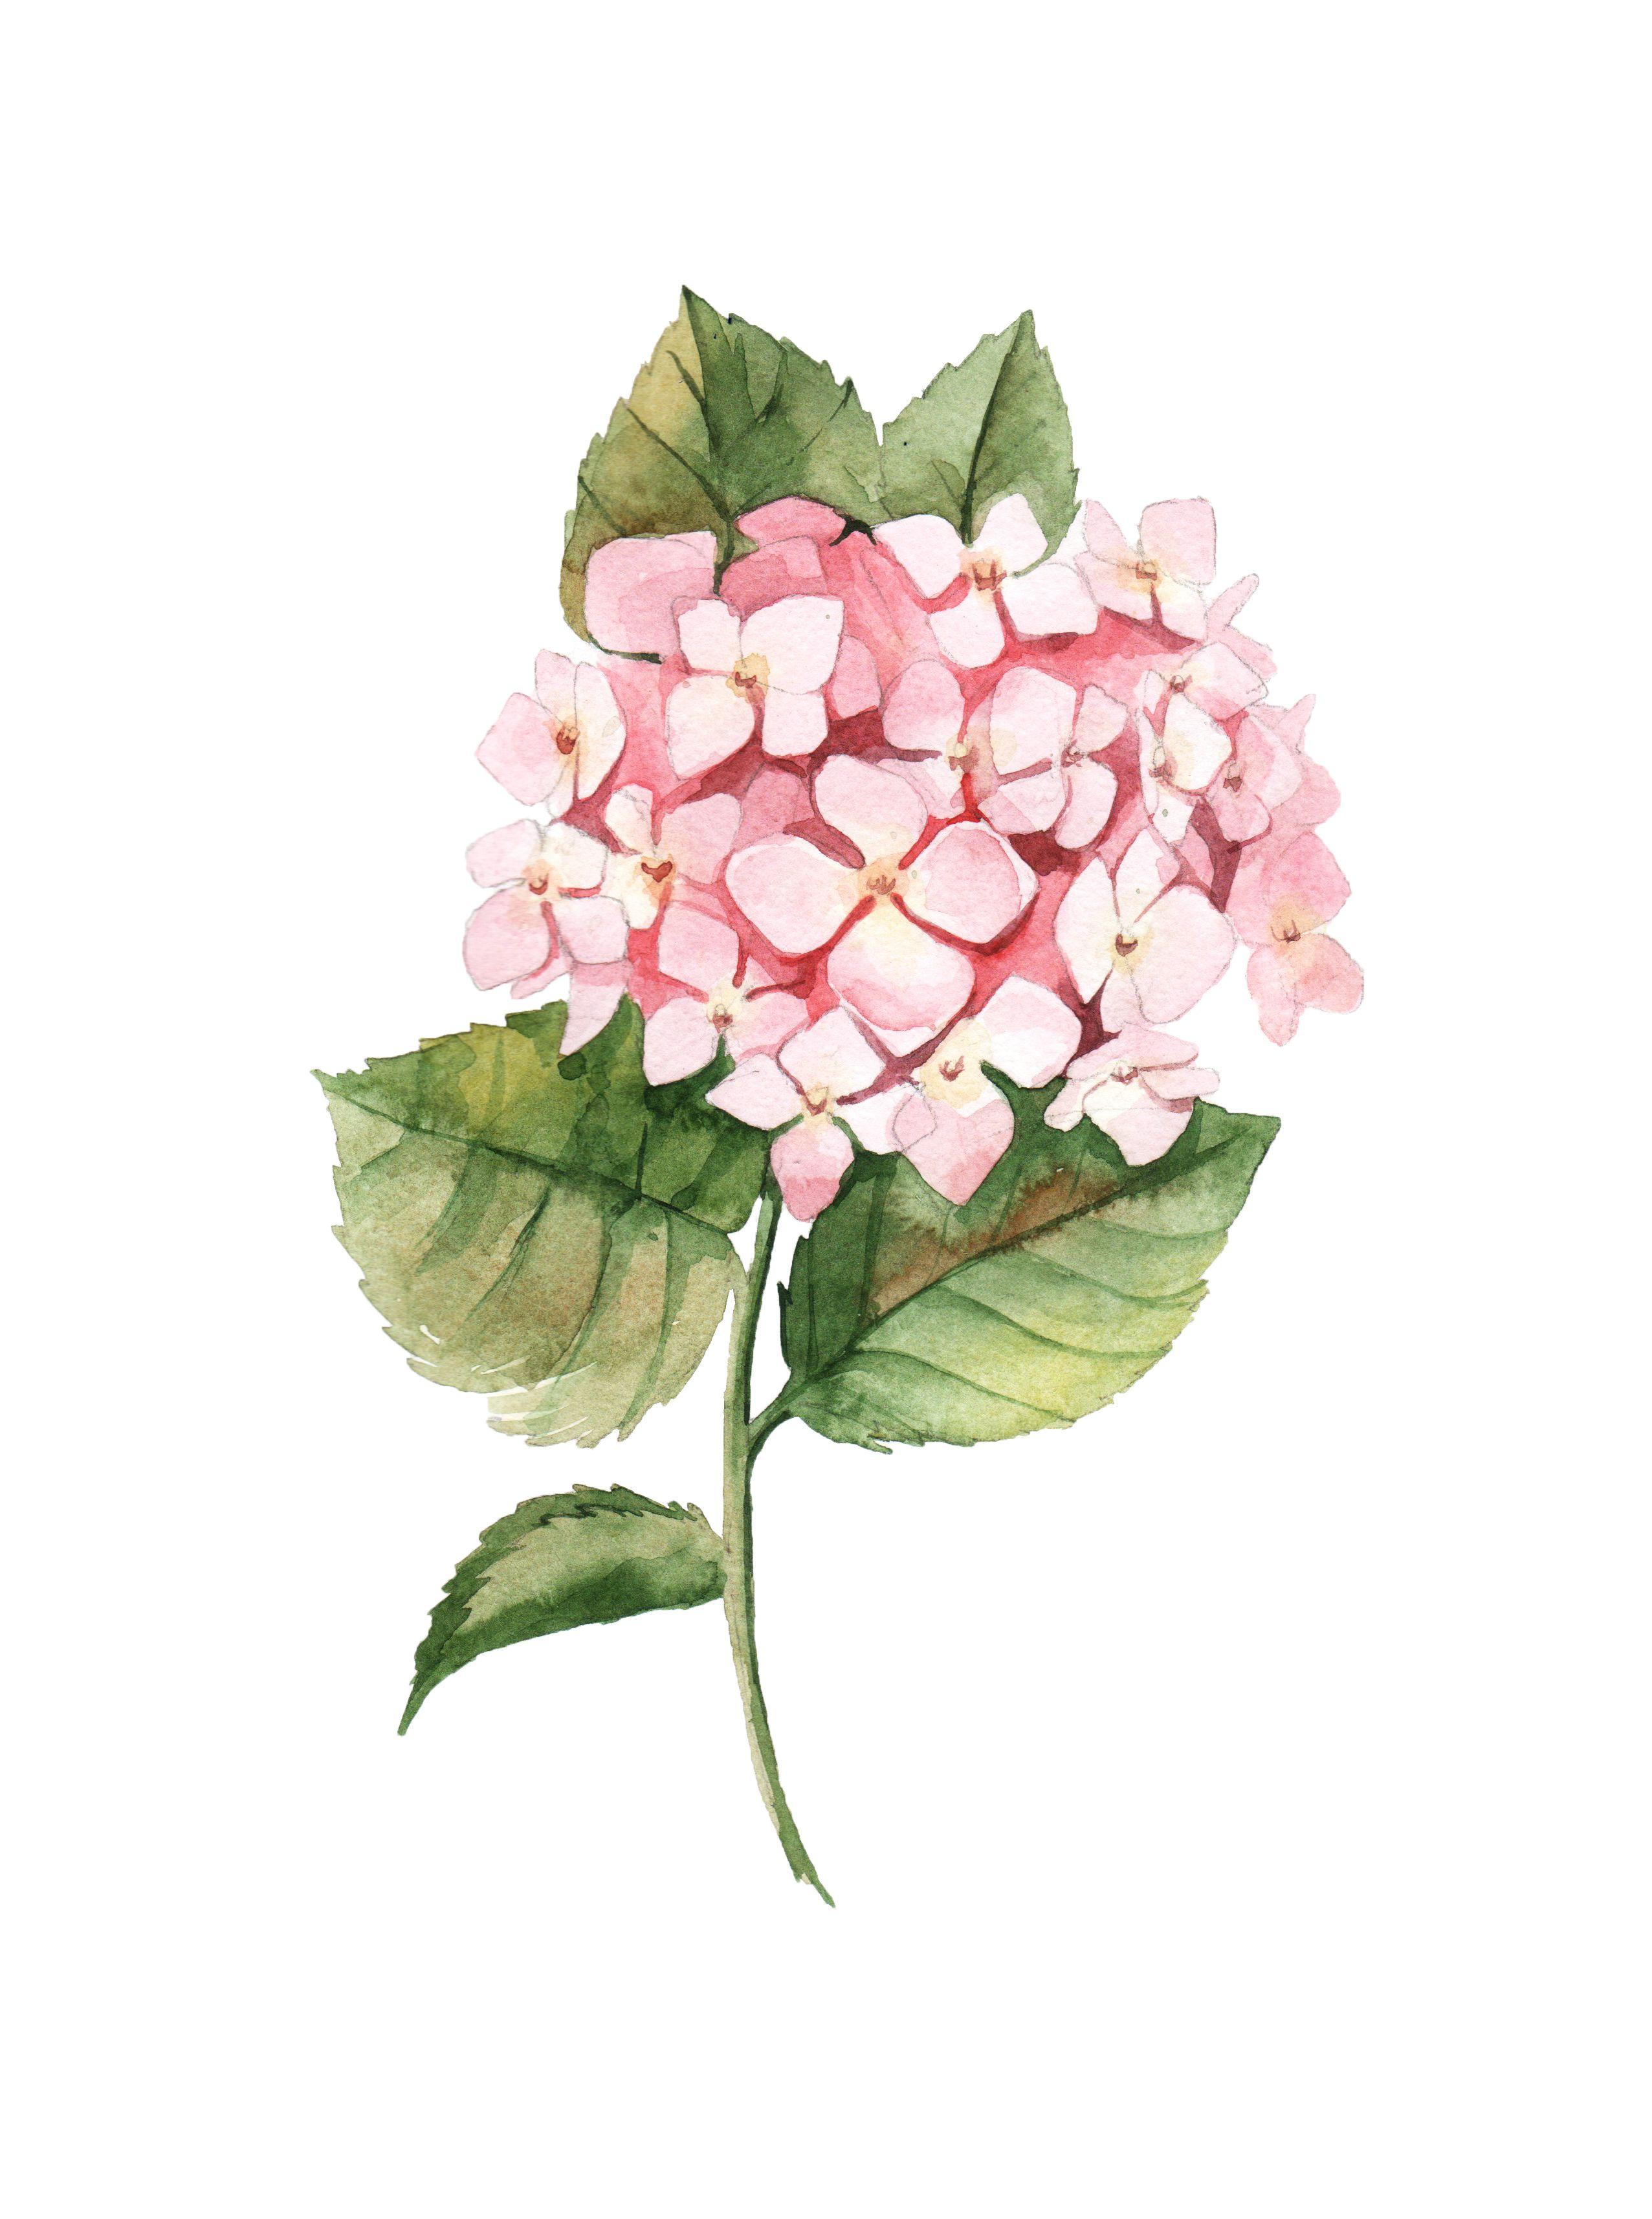 Watercolor Botanical Drawing By Aleksandra Goga Watercolor Hydrangea Botanical Drawings Watercolor Hydrangea Floral Watercolor